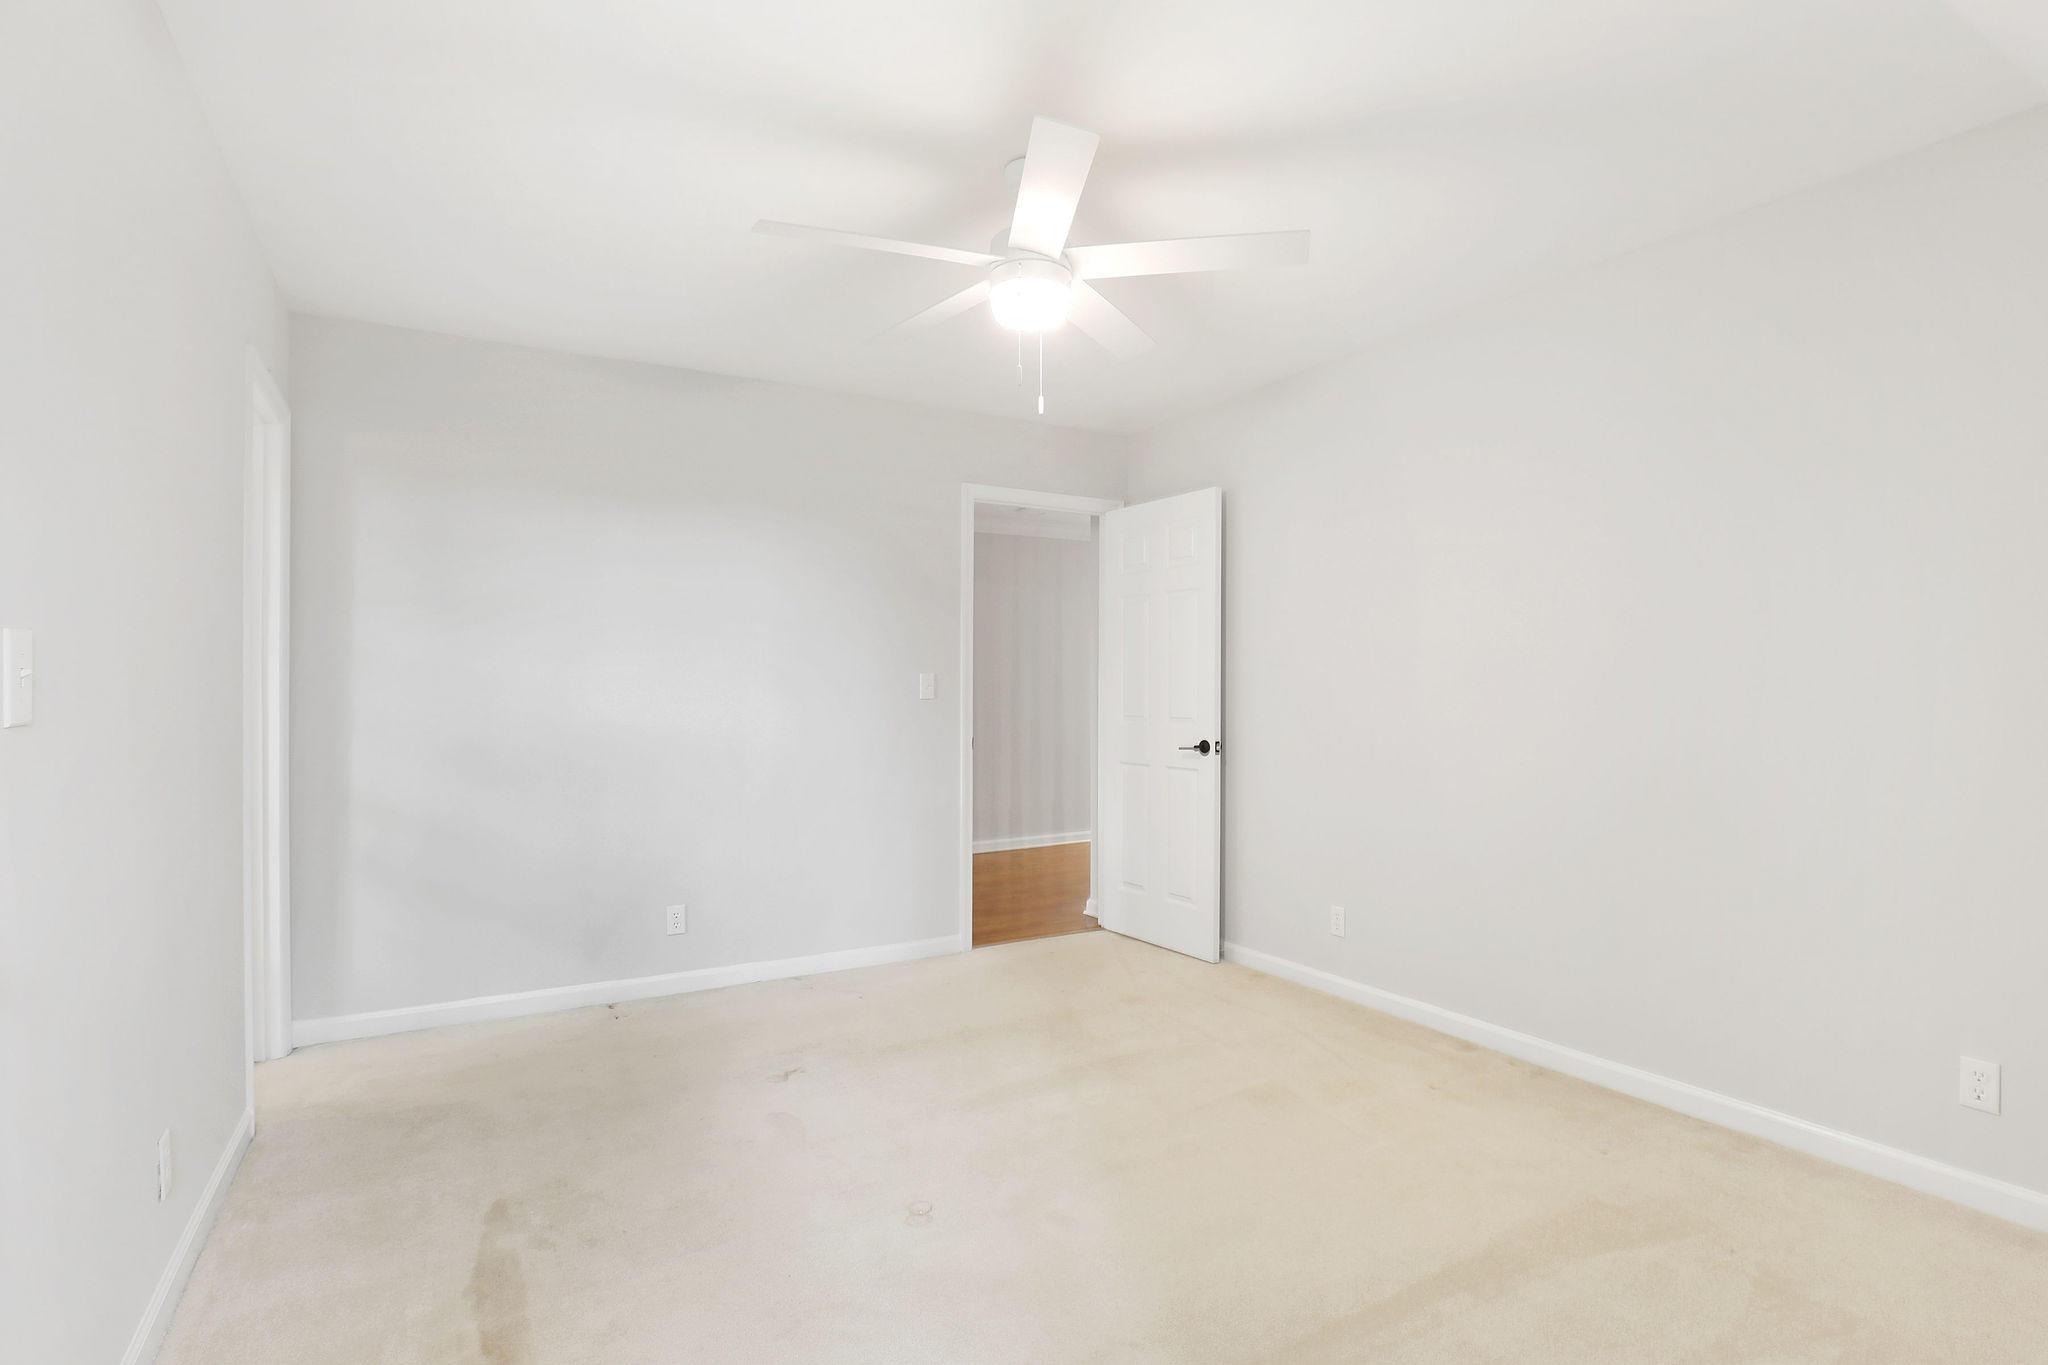 Old Mt Pleasant Homes For Sale - 1417 Edwards, Mount Pleasant, SC - 7